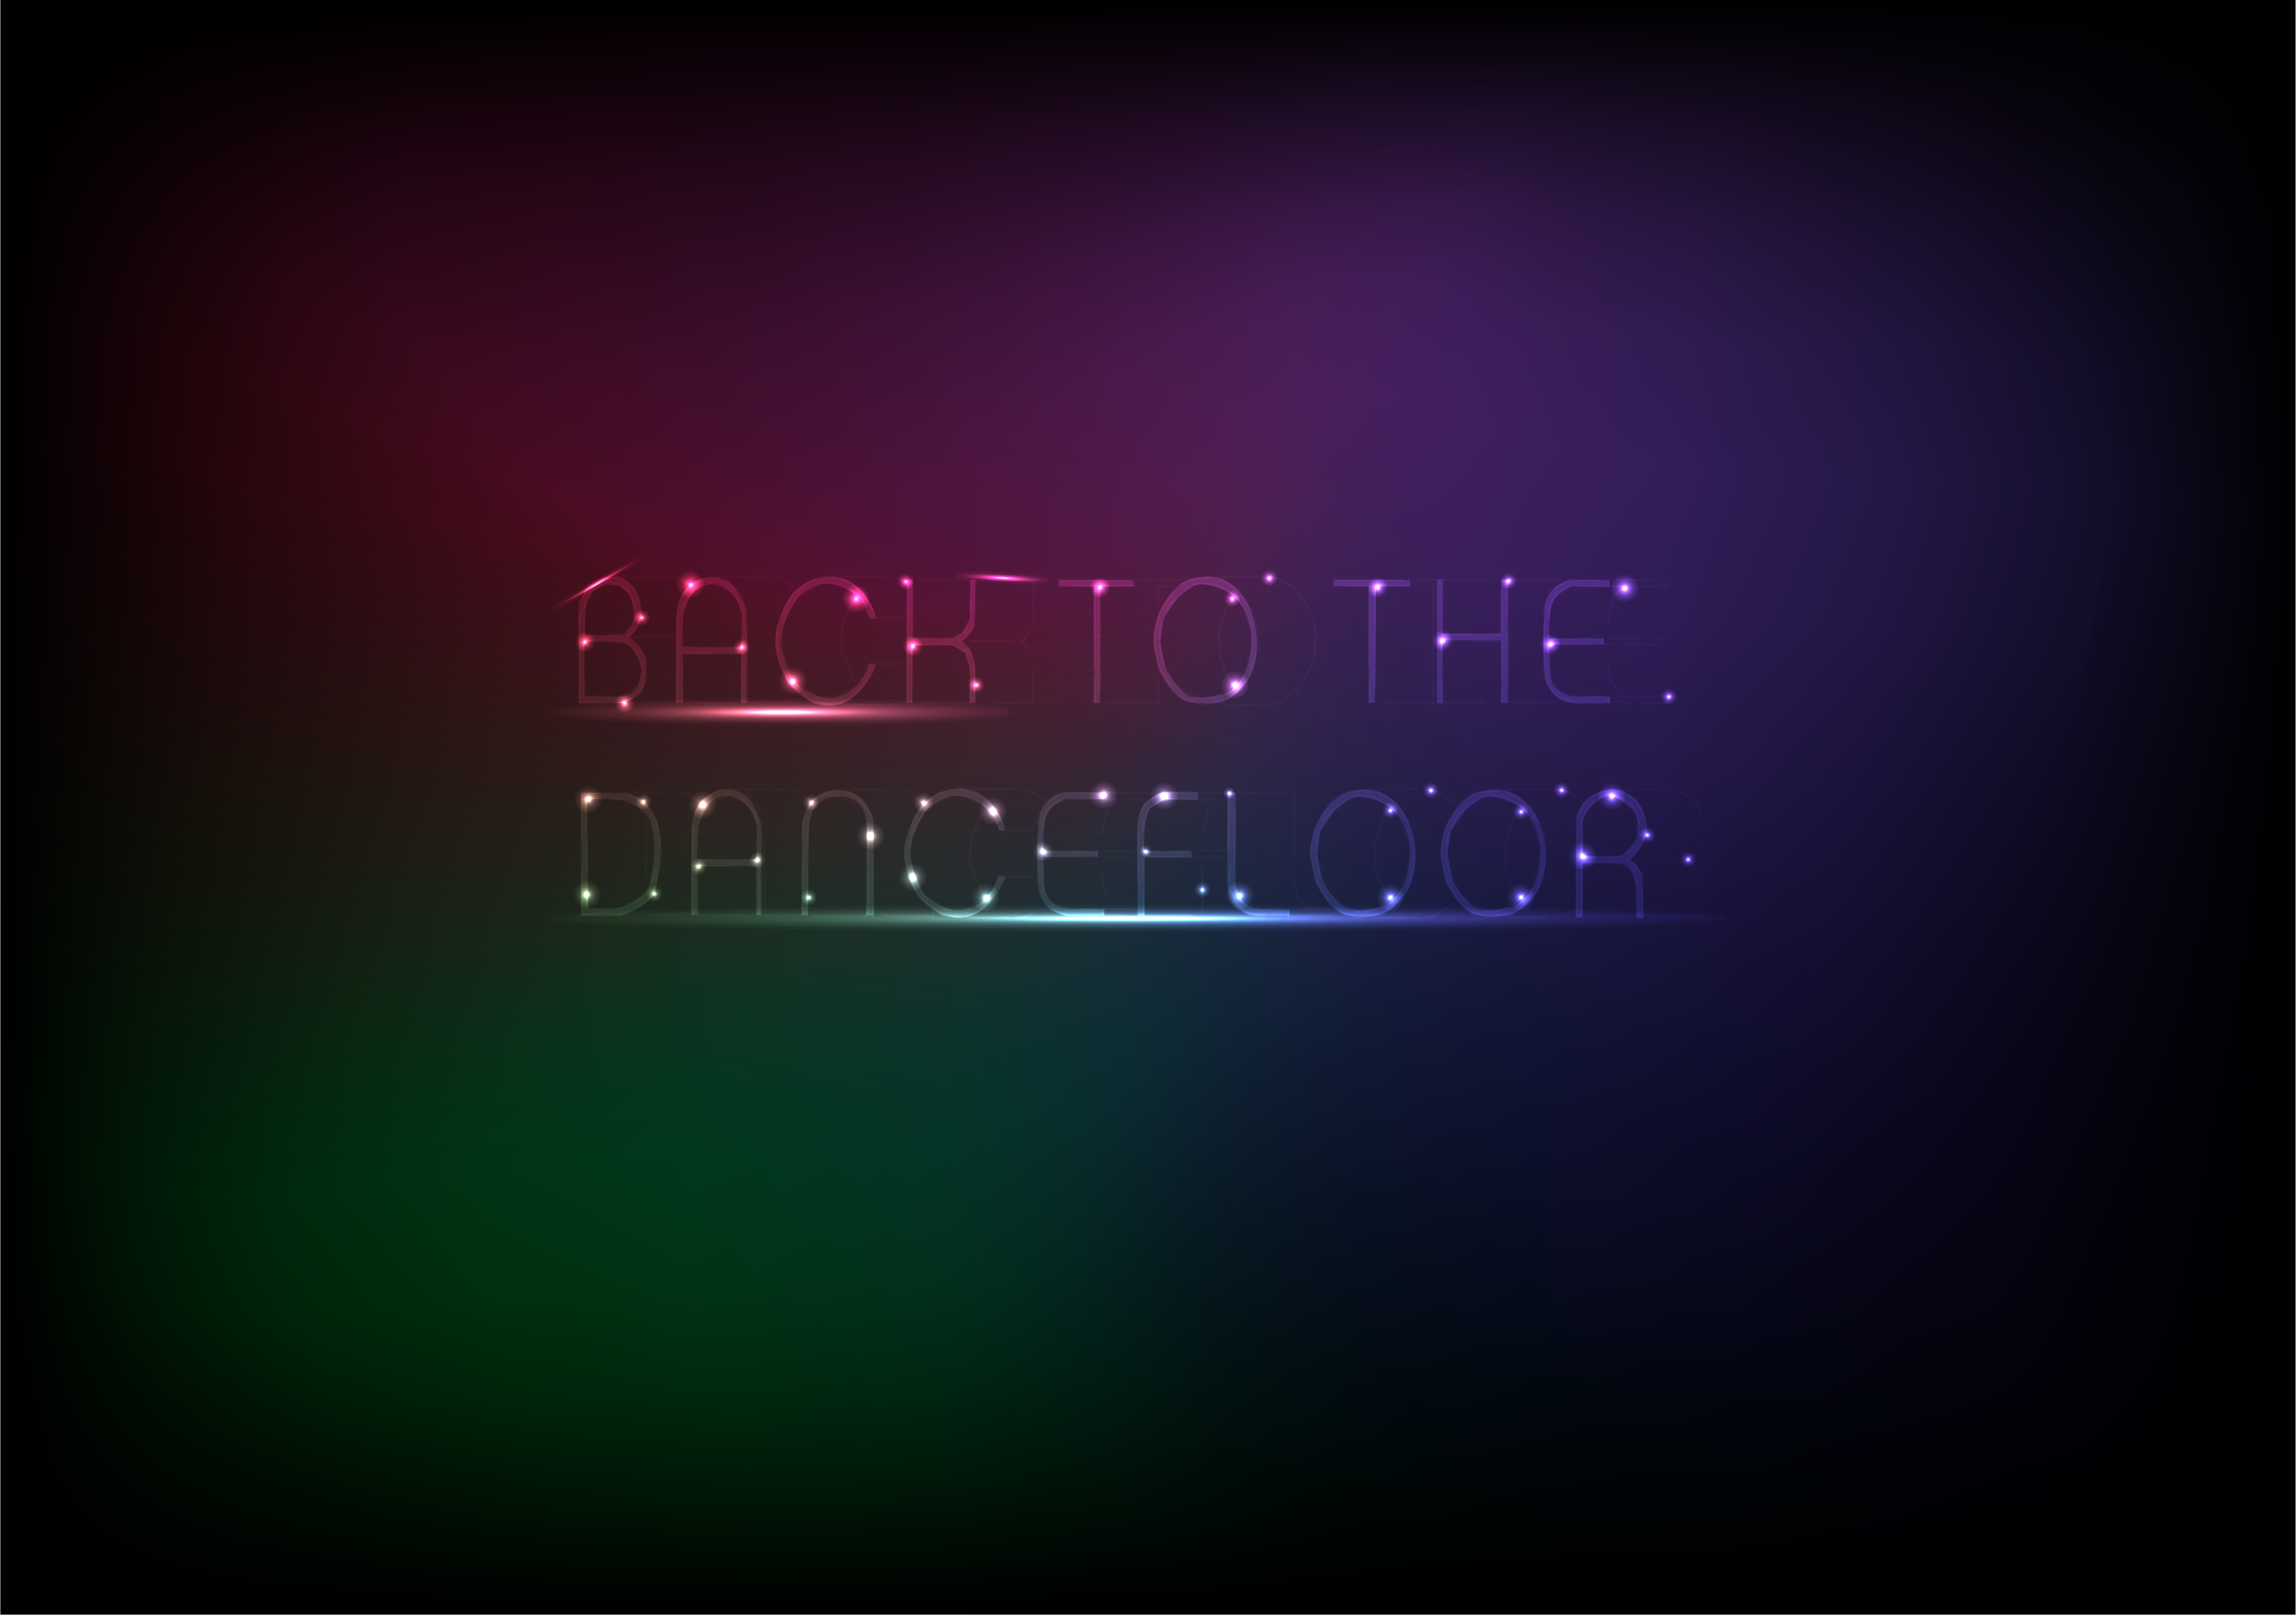 Neon Text Effect – Adobe Illustrator – DancingInOrbit